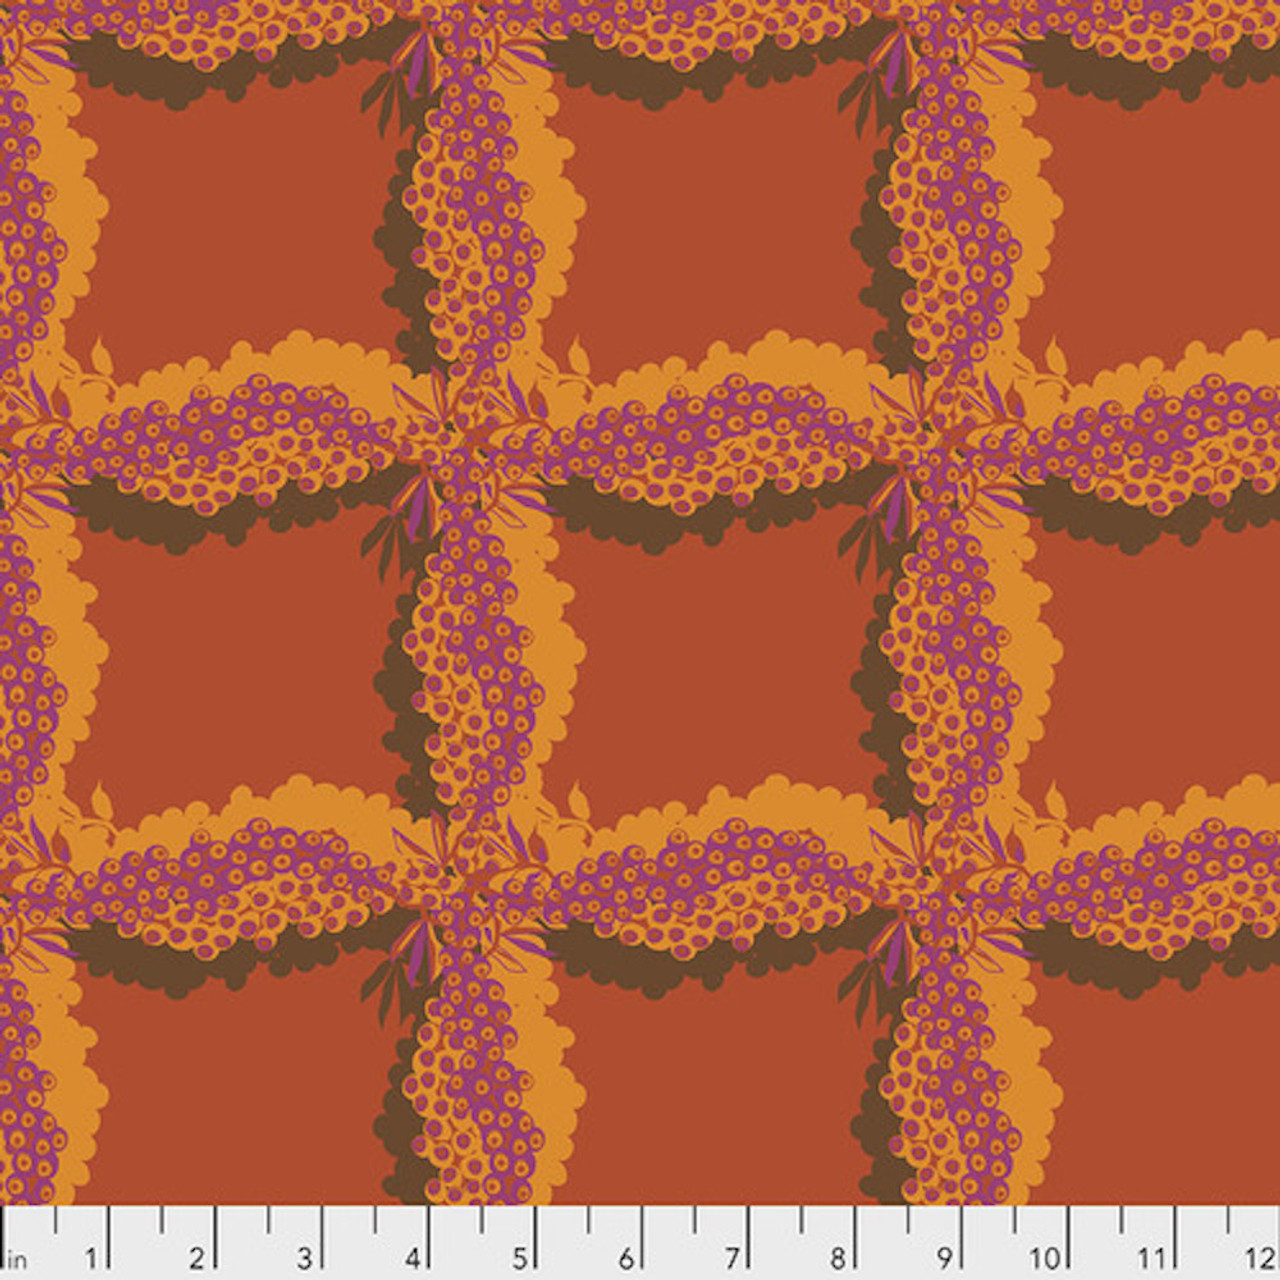 Kathy Doughty PWMO035 Seeds & Stems Woven Cinnamon Cotton Fabric By Yard